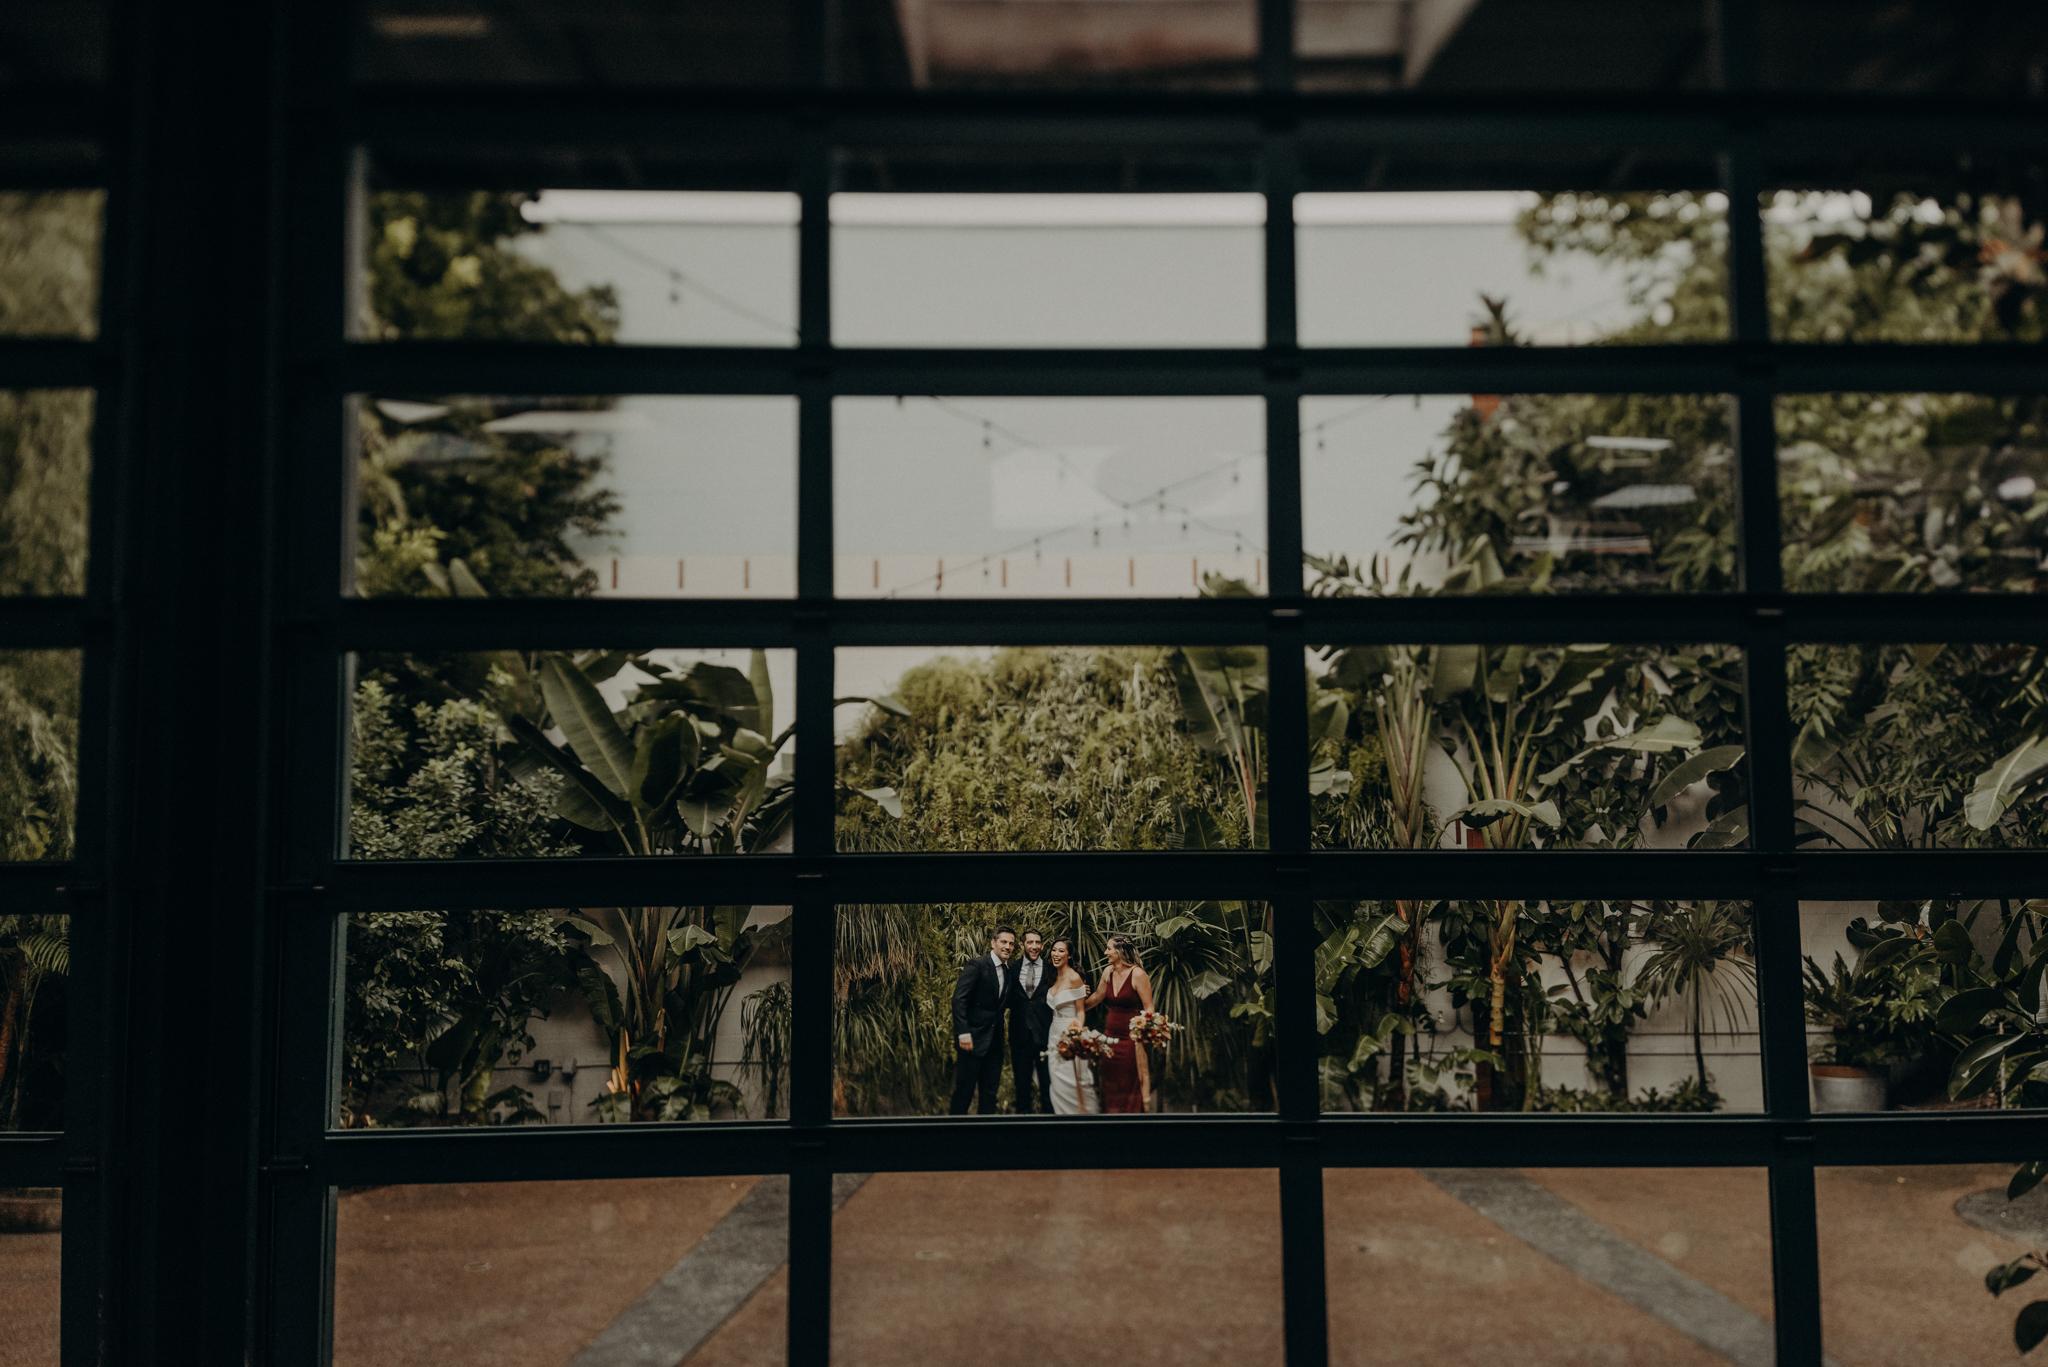 Wedding Photo LA - wedding photographer in los angeles - millwick wedding venue -isaiahandtaylor.com-059.jpg